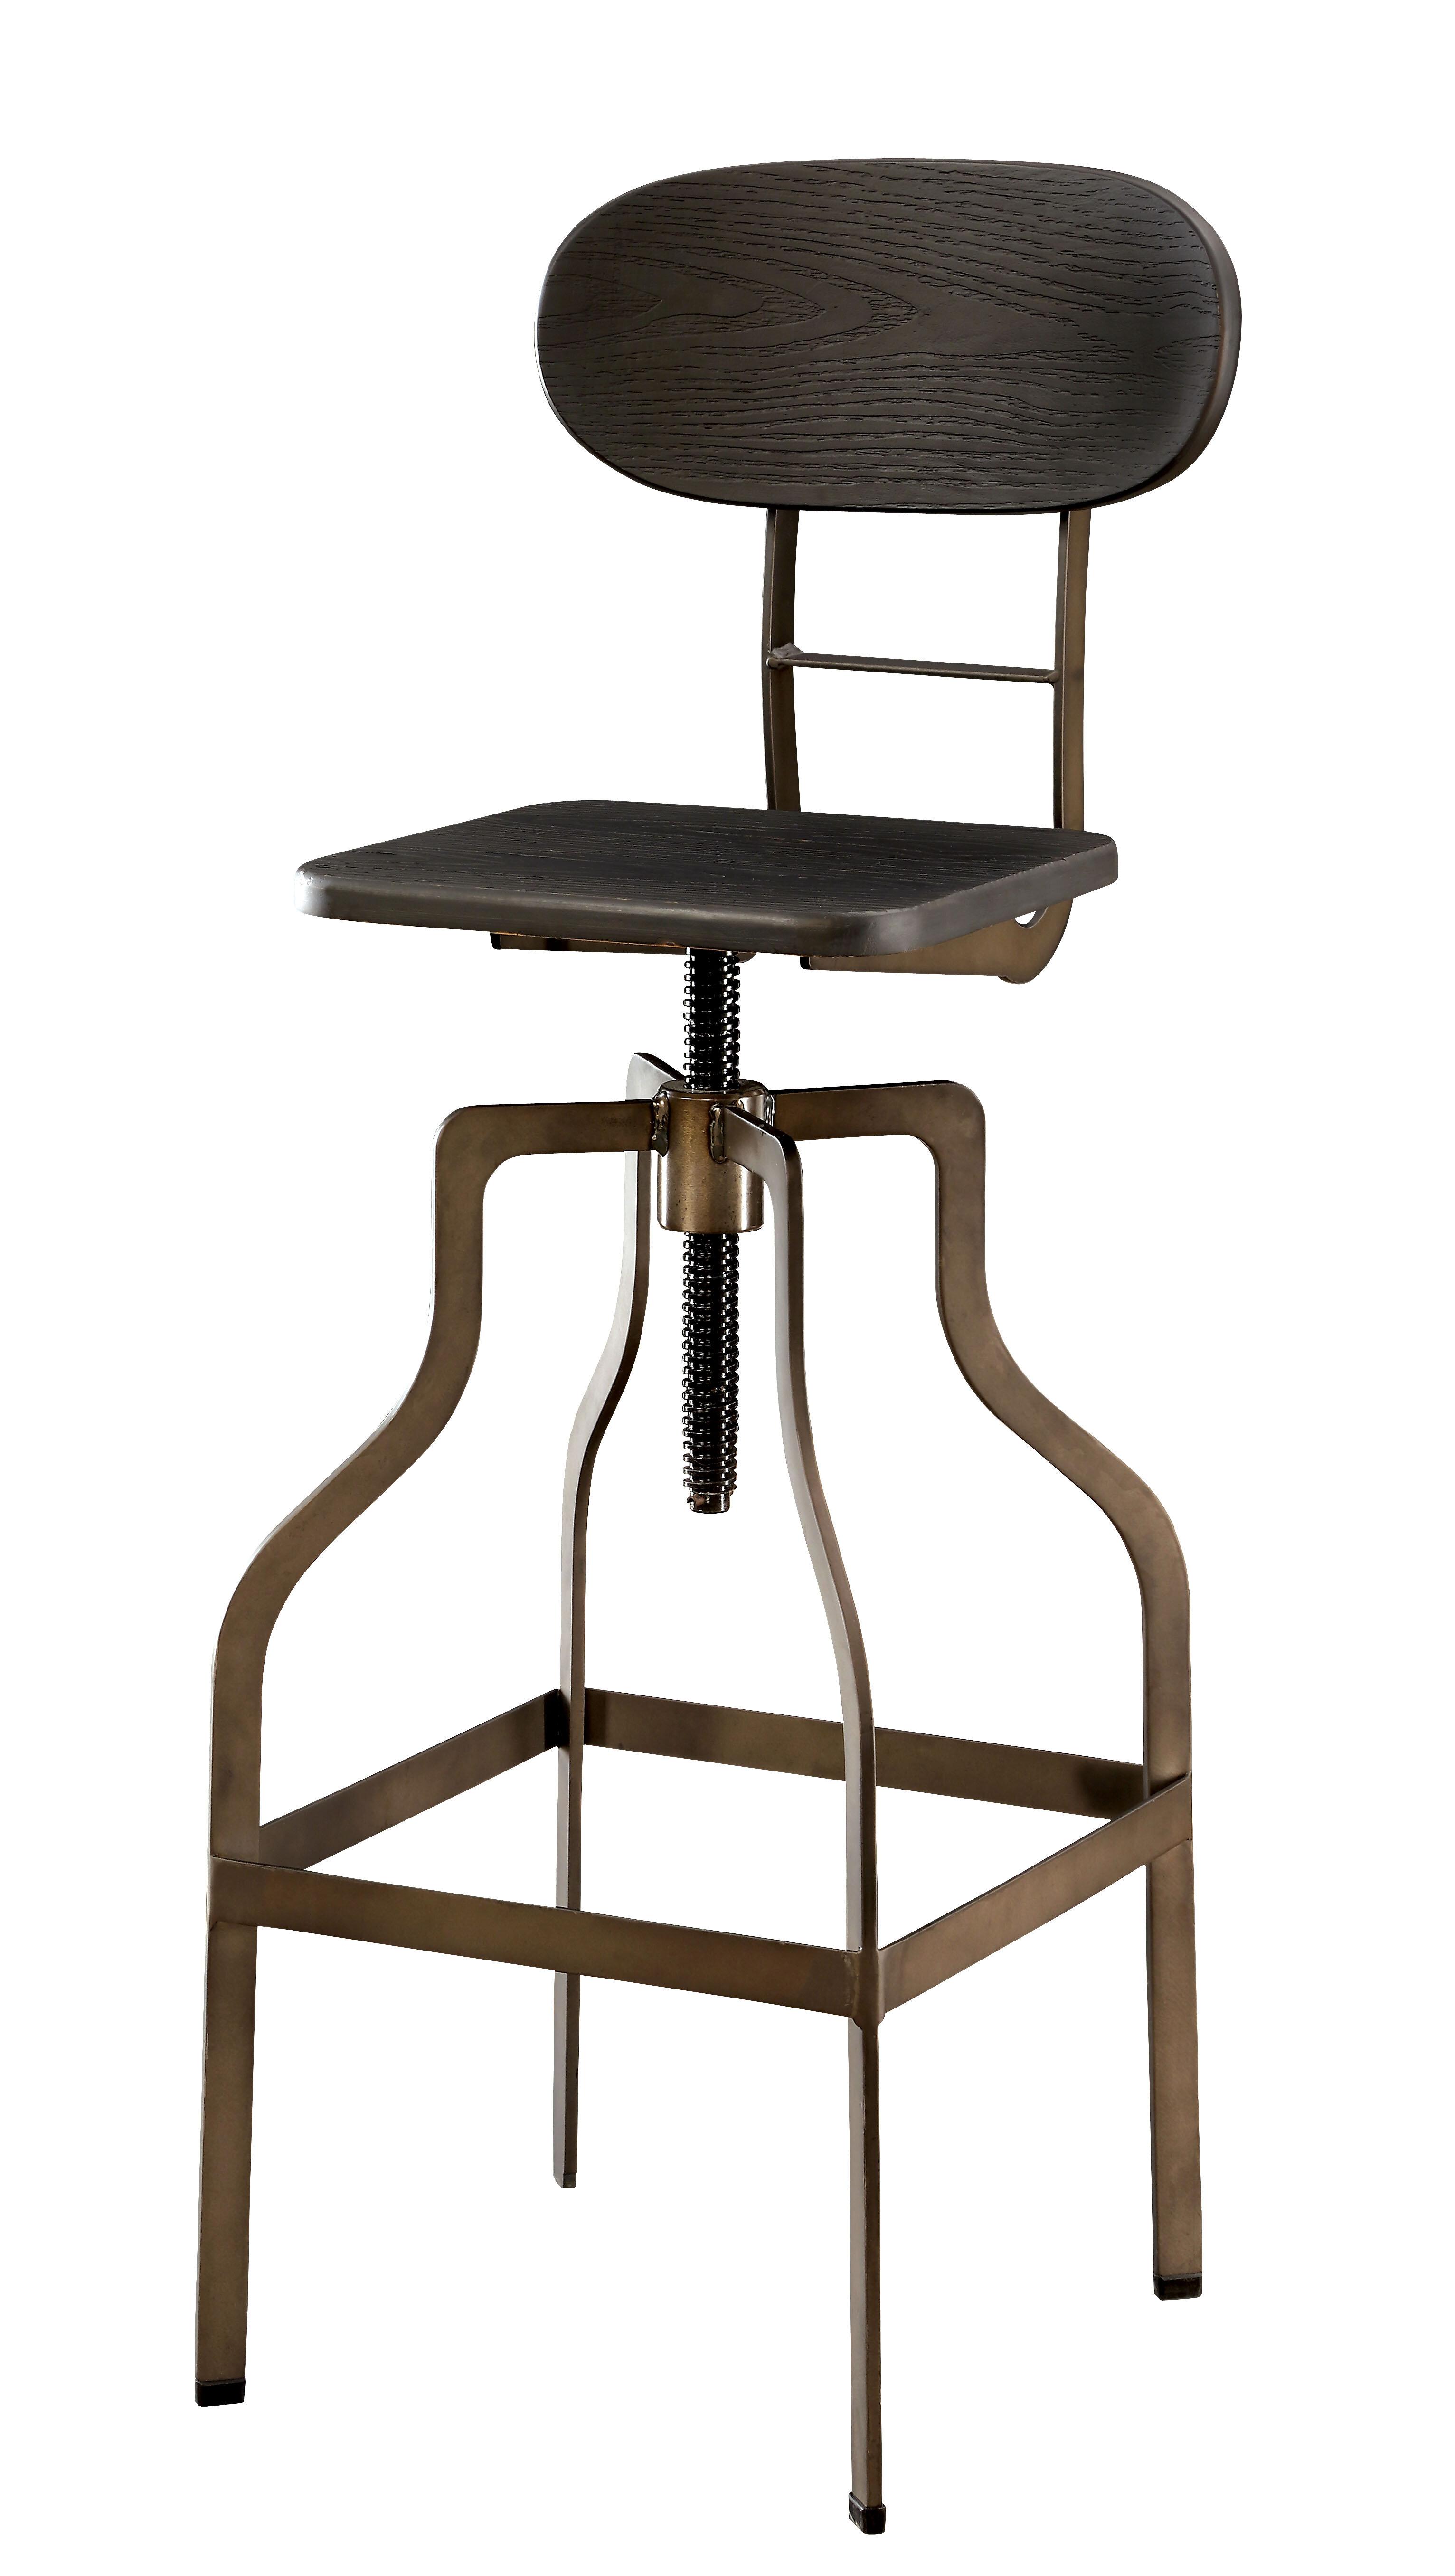 Super Denice Metal 34 Adjustable Height Swivel Bar Stool Ibusinesslaw Wood Chair Design Ideas Ibusinesslaworg